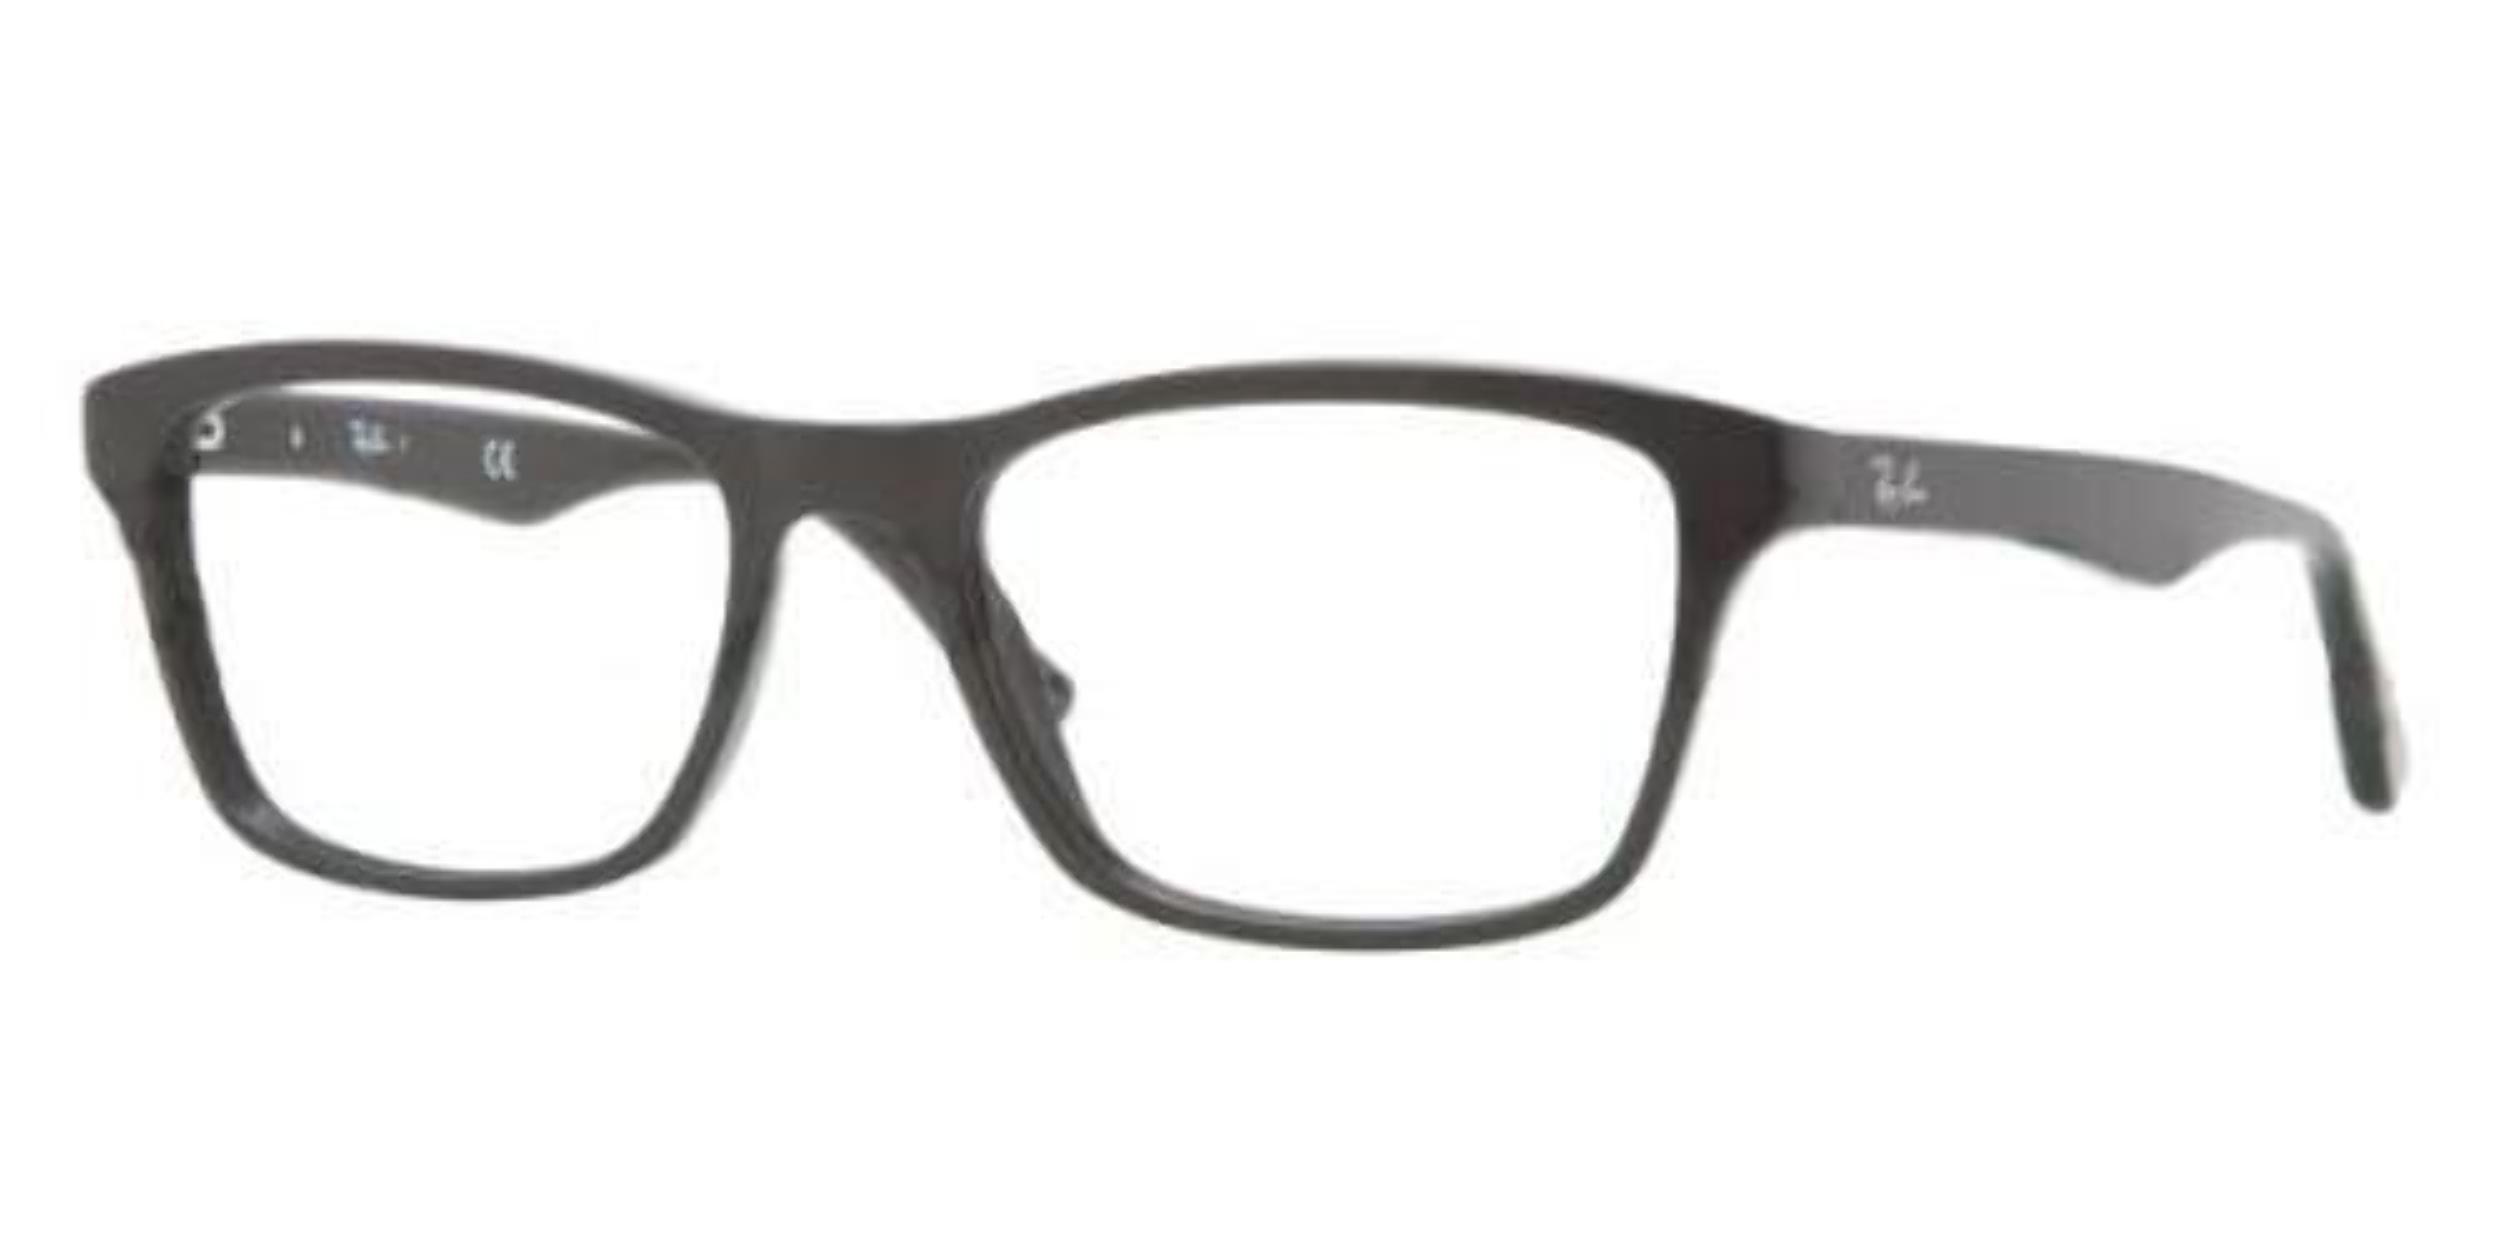 a4ec84b4dbb Ray Ban Eyeglasses Frames Women Top Deals   Lowest Price ...